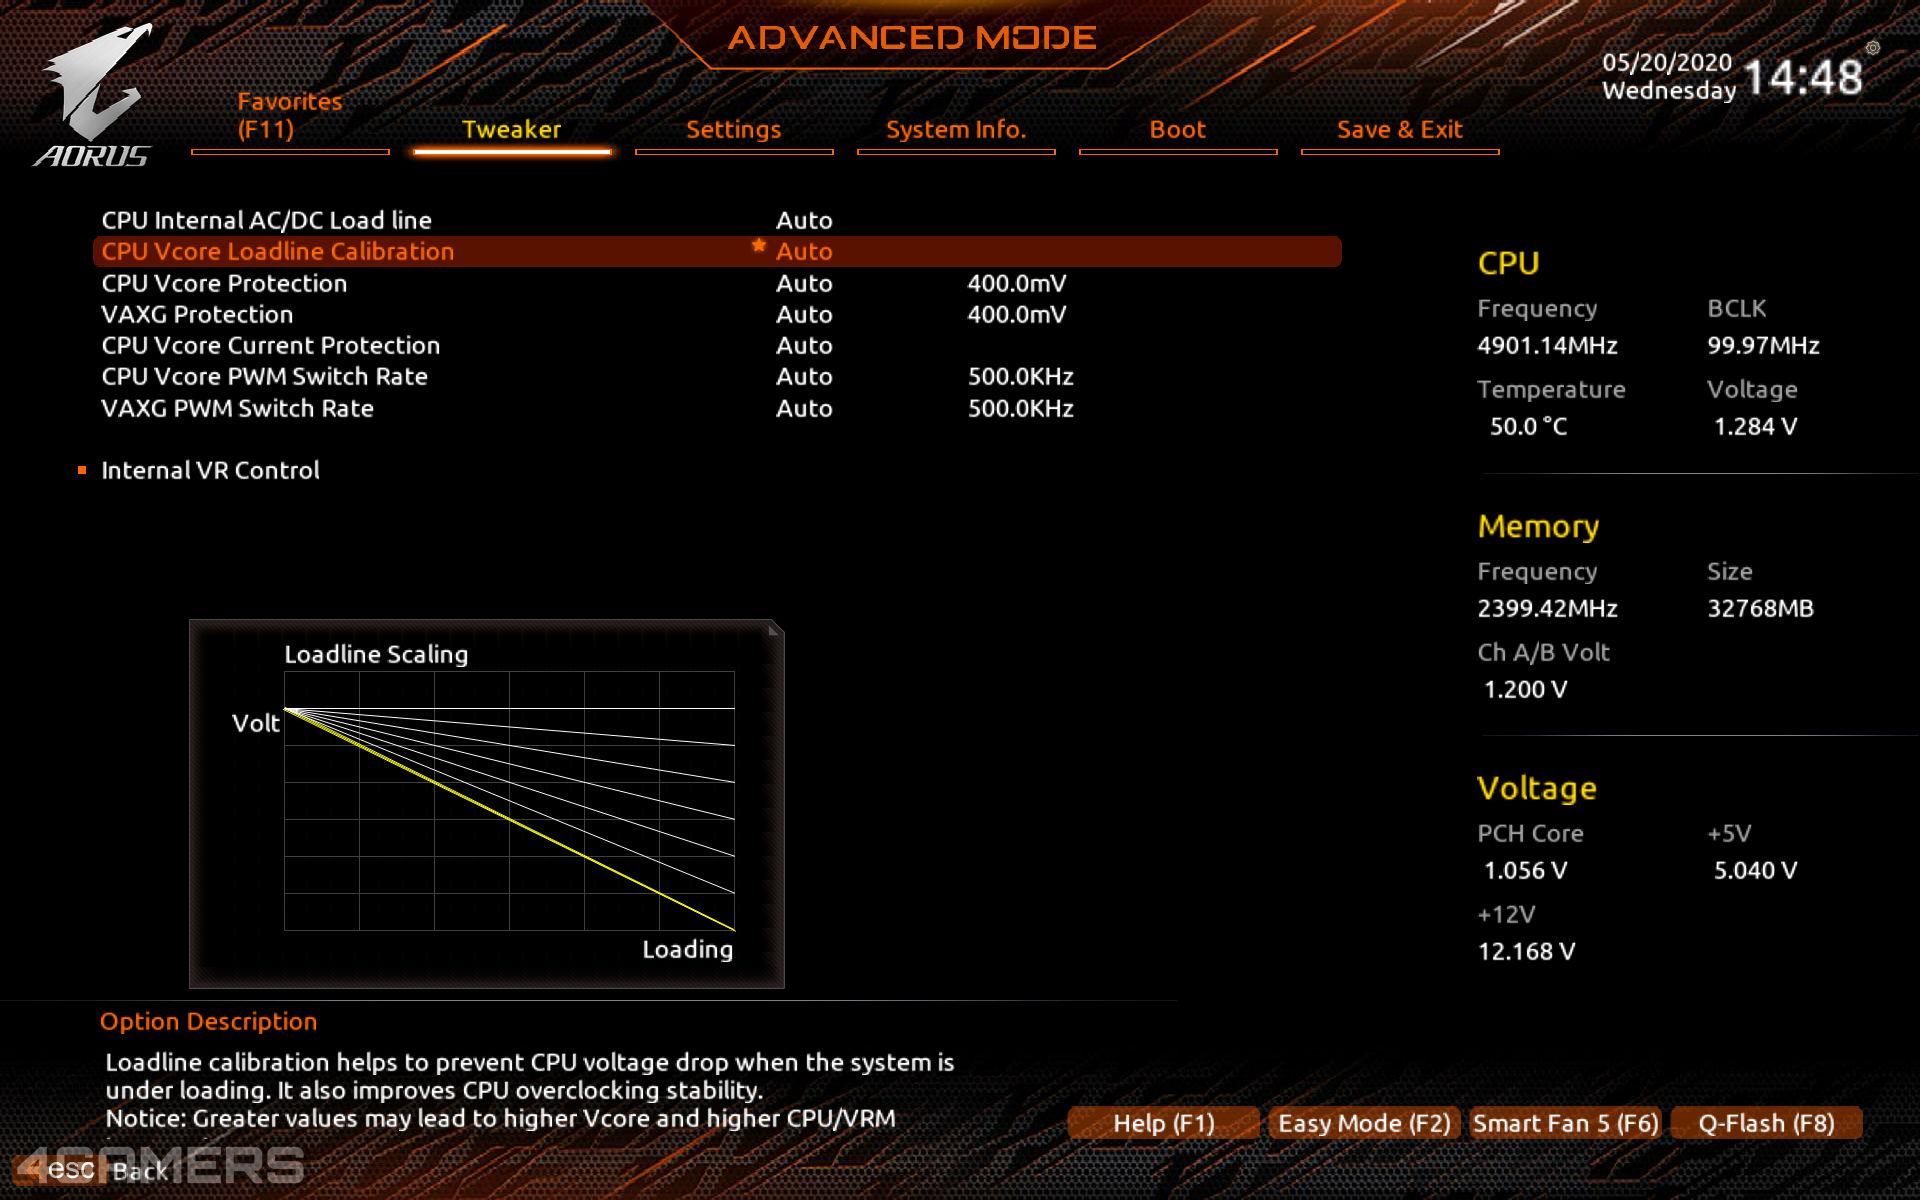 GIGABYTE Z490 AORUS Master BIOS